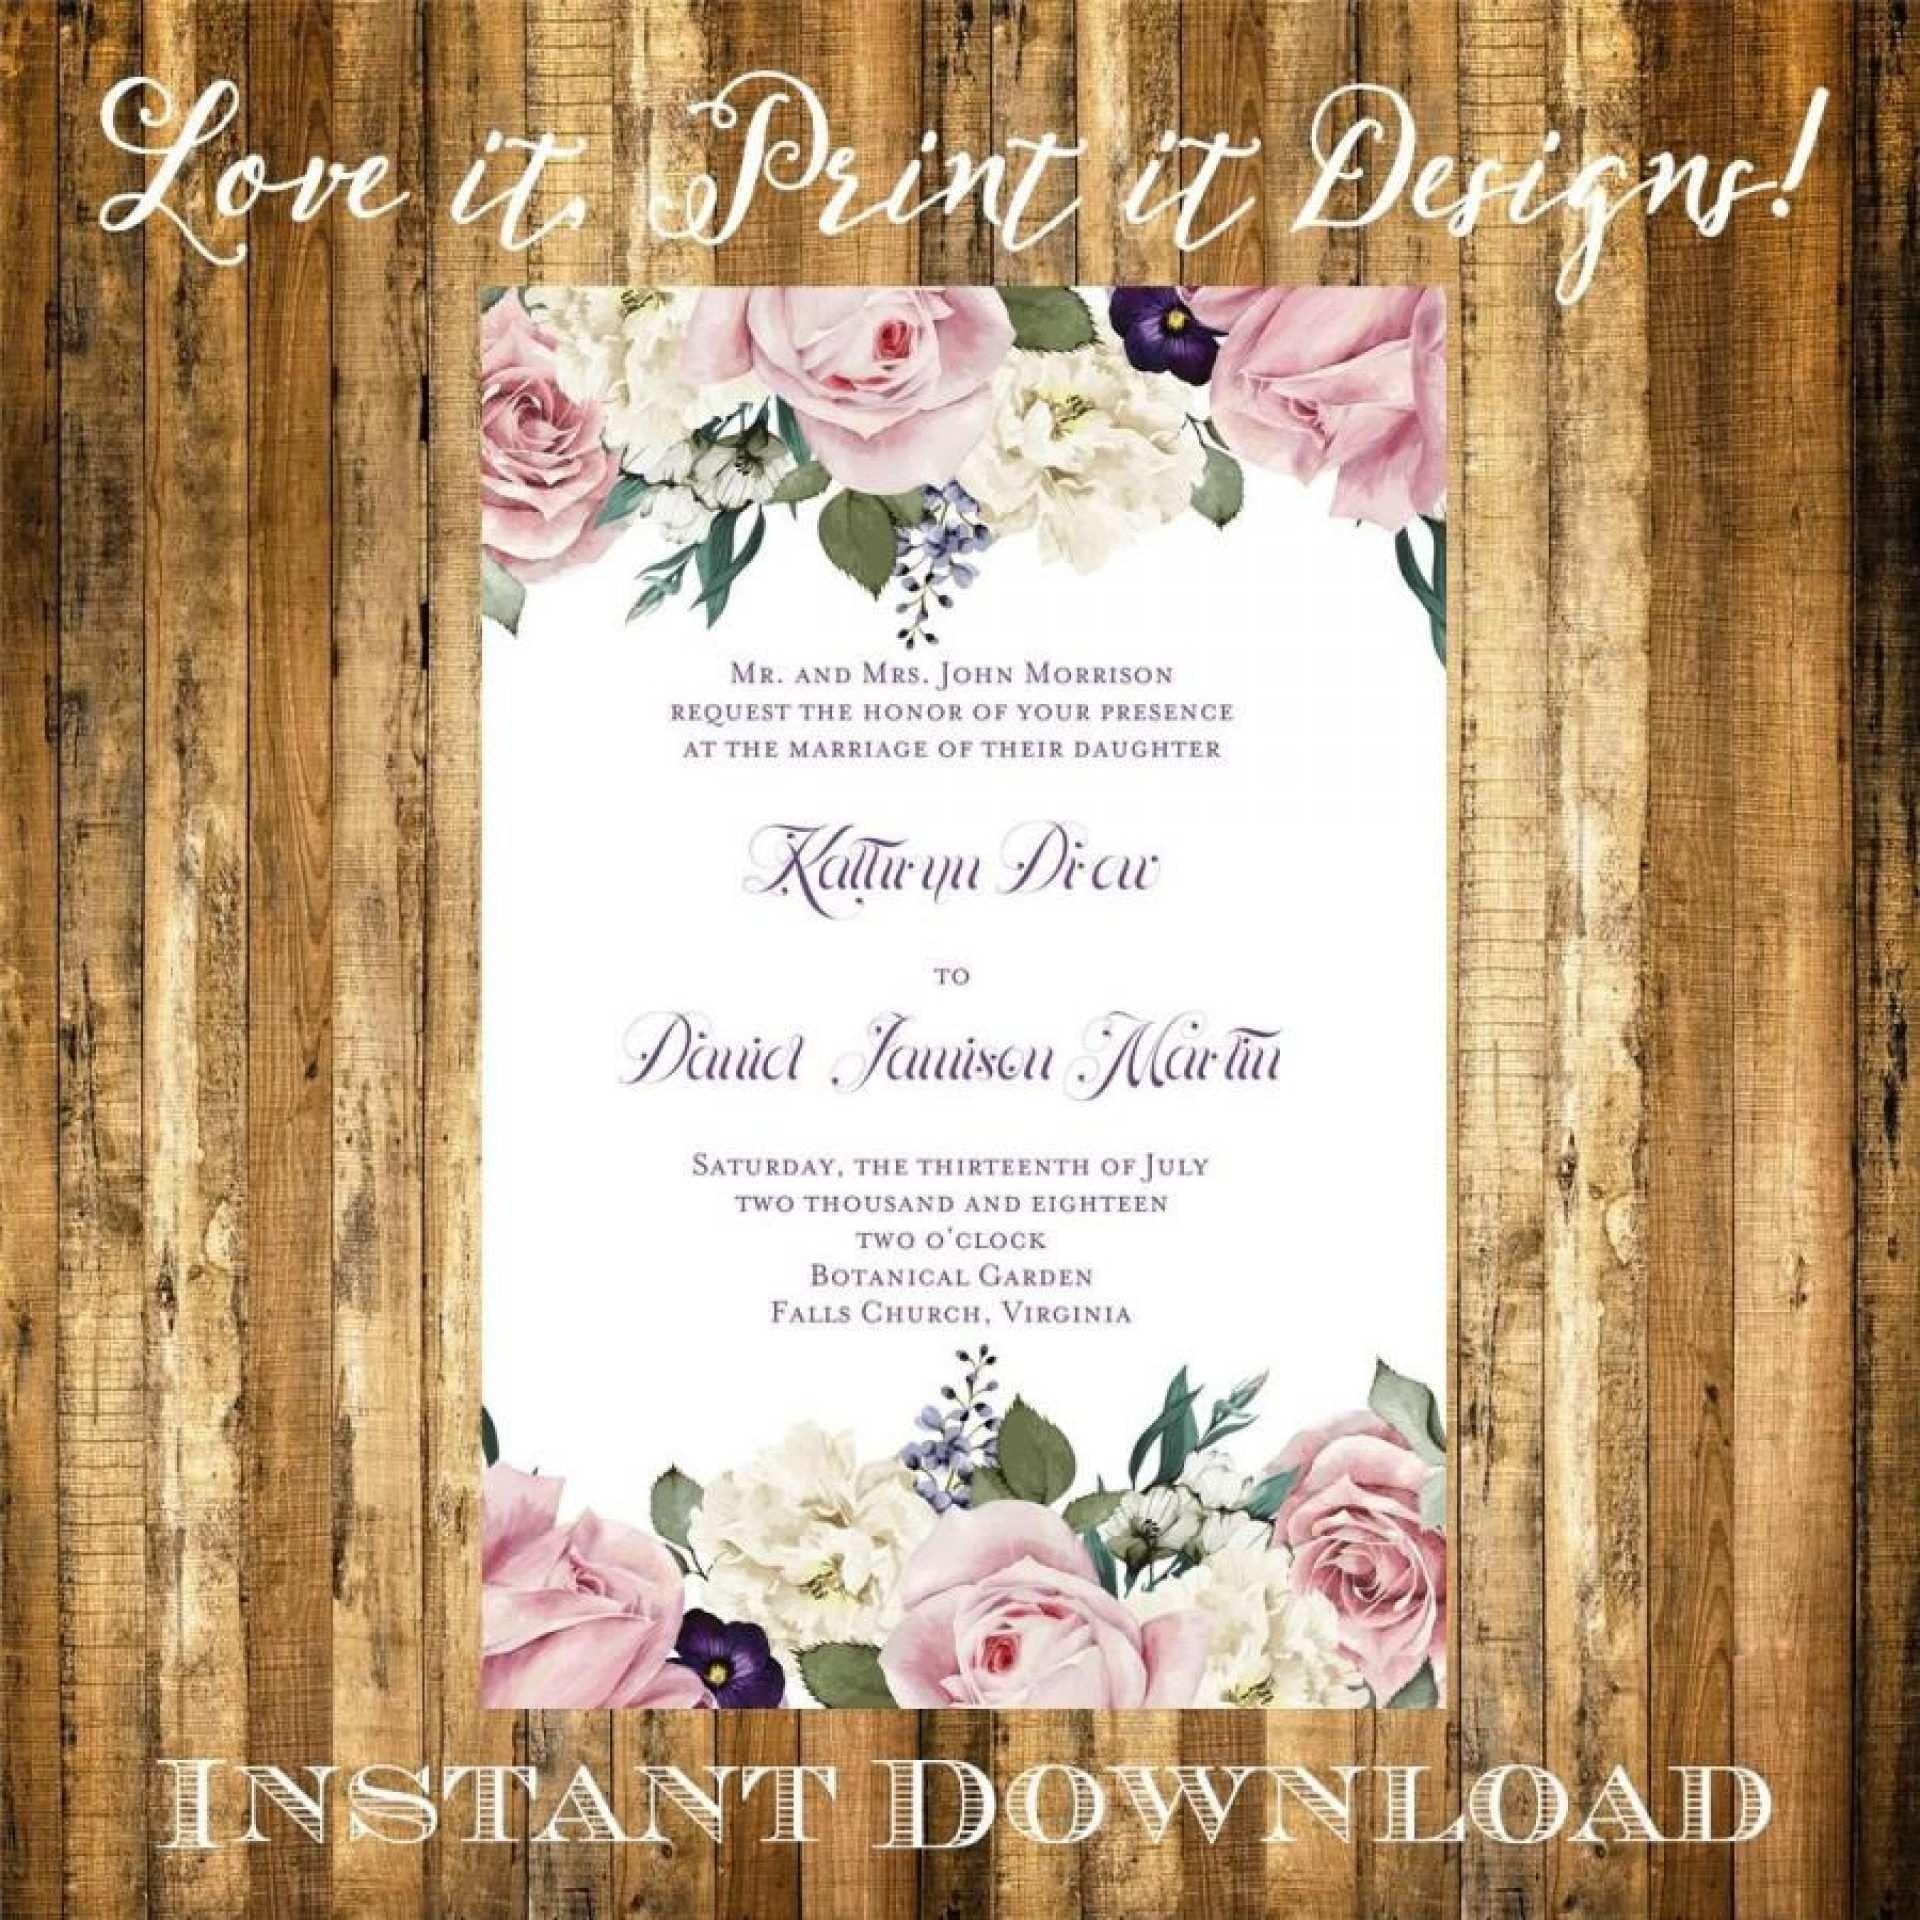 002 Incredible Microsoft Word Wedding Invitation Template Idea  Templates M Editable Free Download ChineseFull